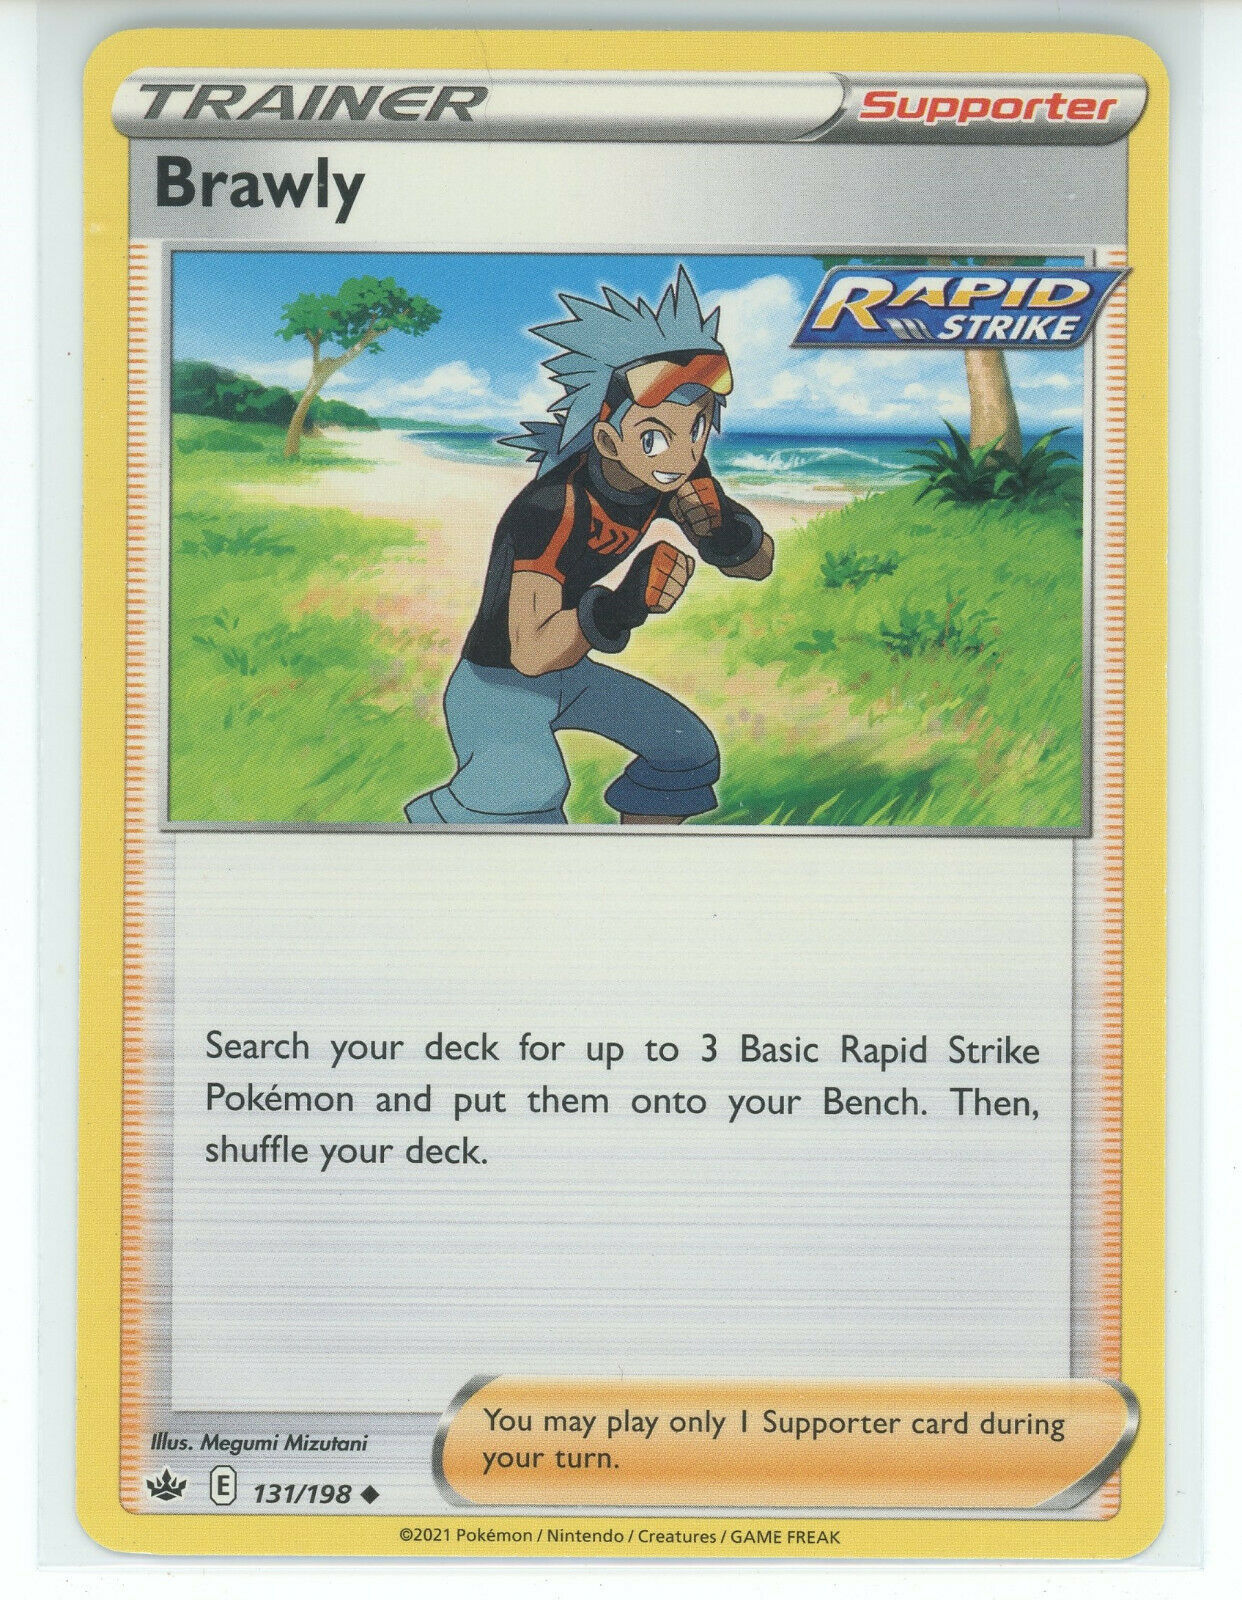 Pokemon 2021 S&S Chilling Reign Trainer Brawly 131/198 Rapid Strike Uncommon